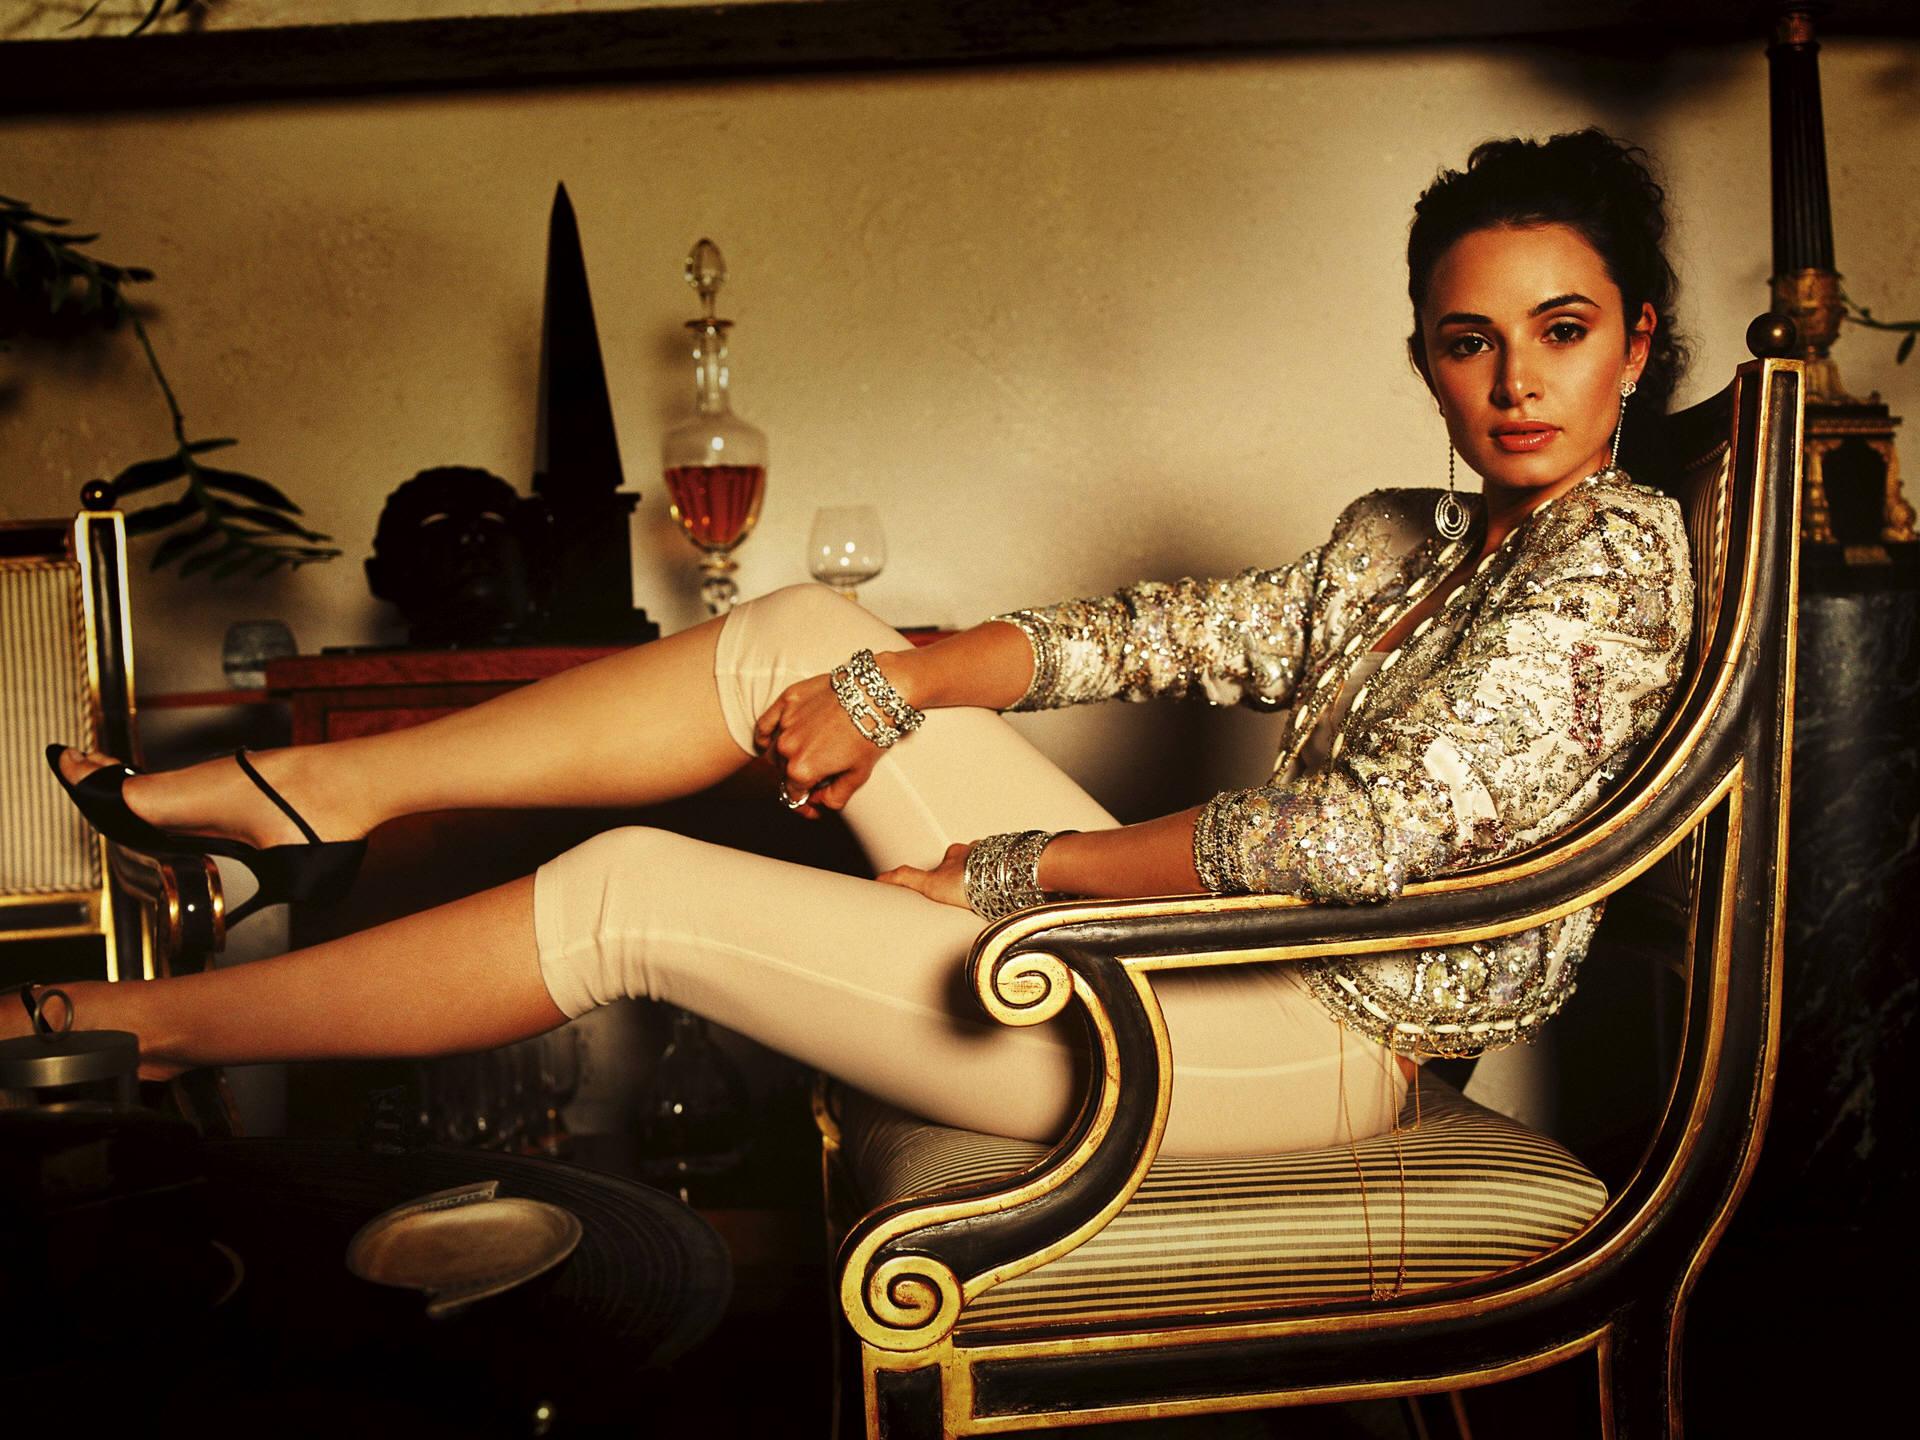 Lost Girl Wallpaper Hd Mia Maestro Legs Mac Heat